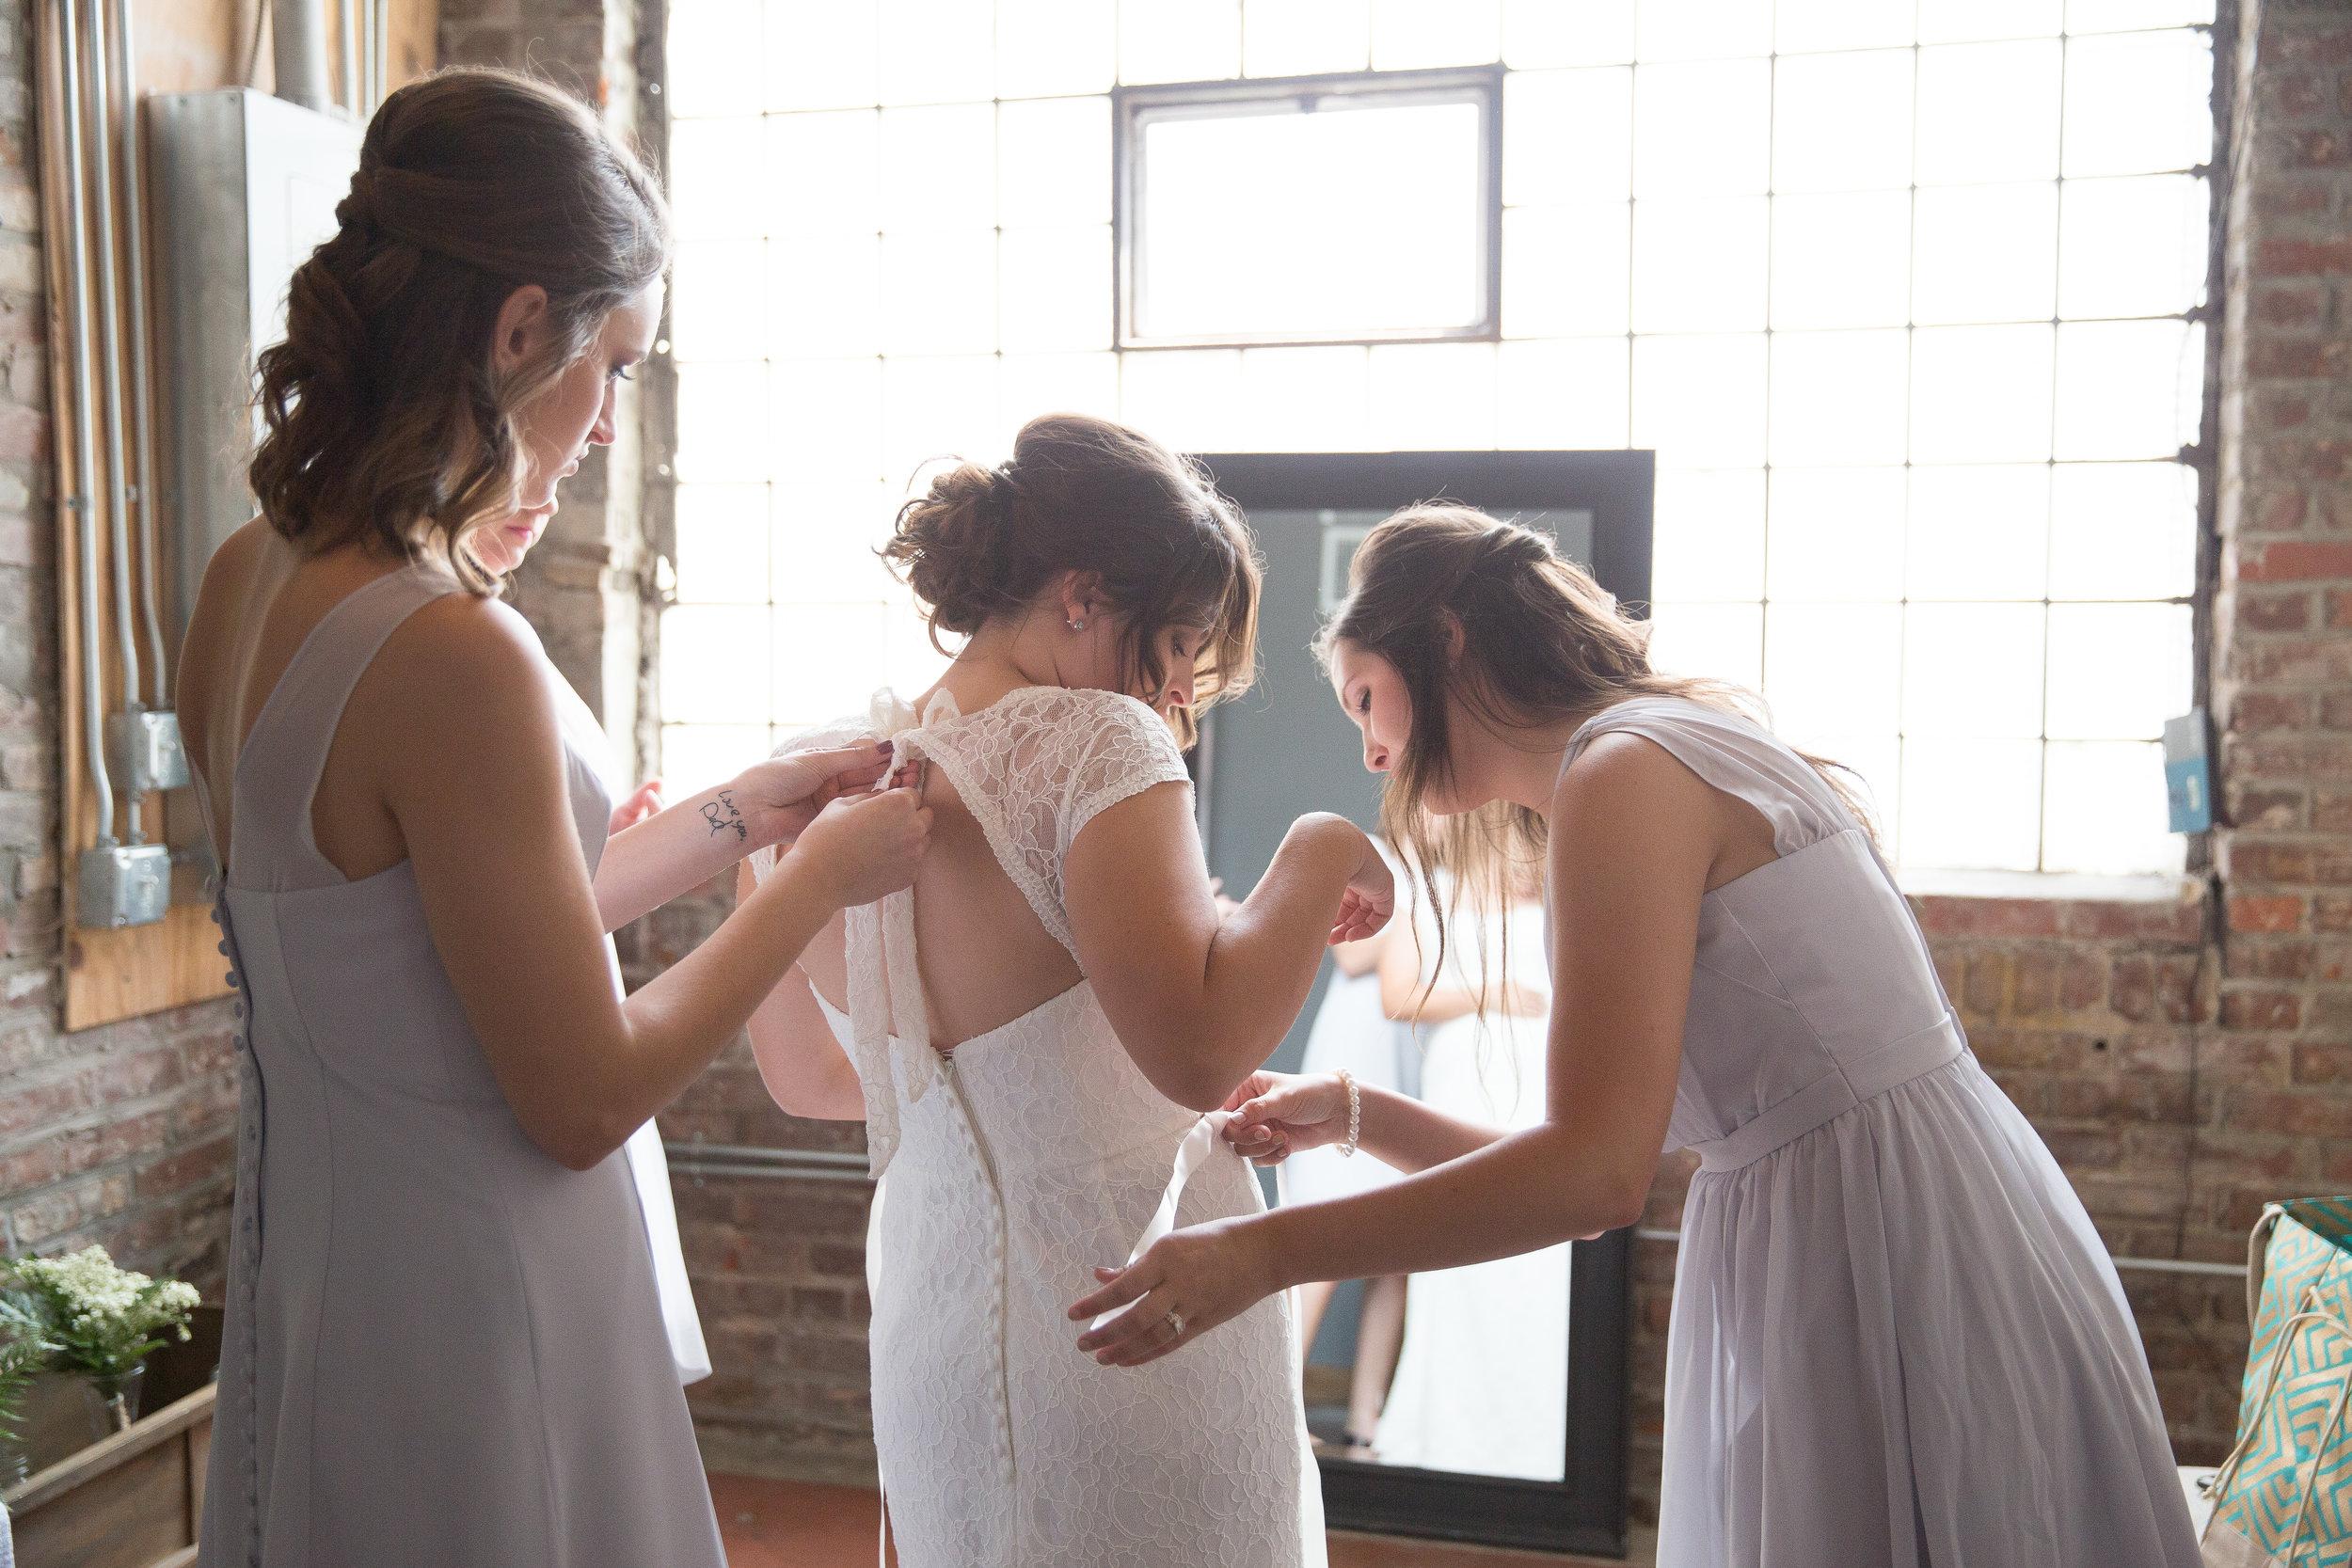 Kansas+City_Small+Wedding_Elope_Intimate_Ceremony_Best+Friends_33.jpg